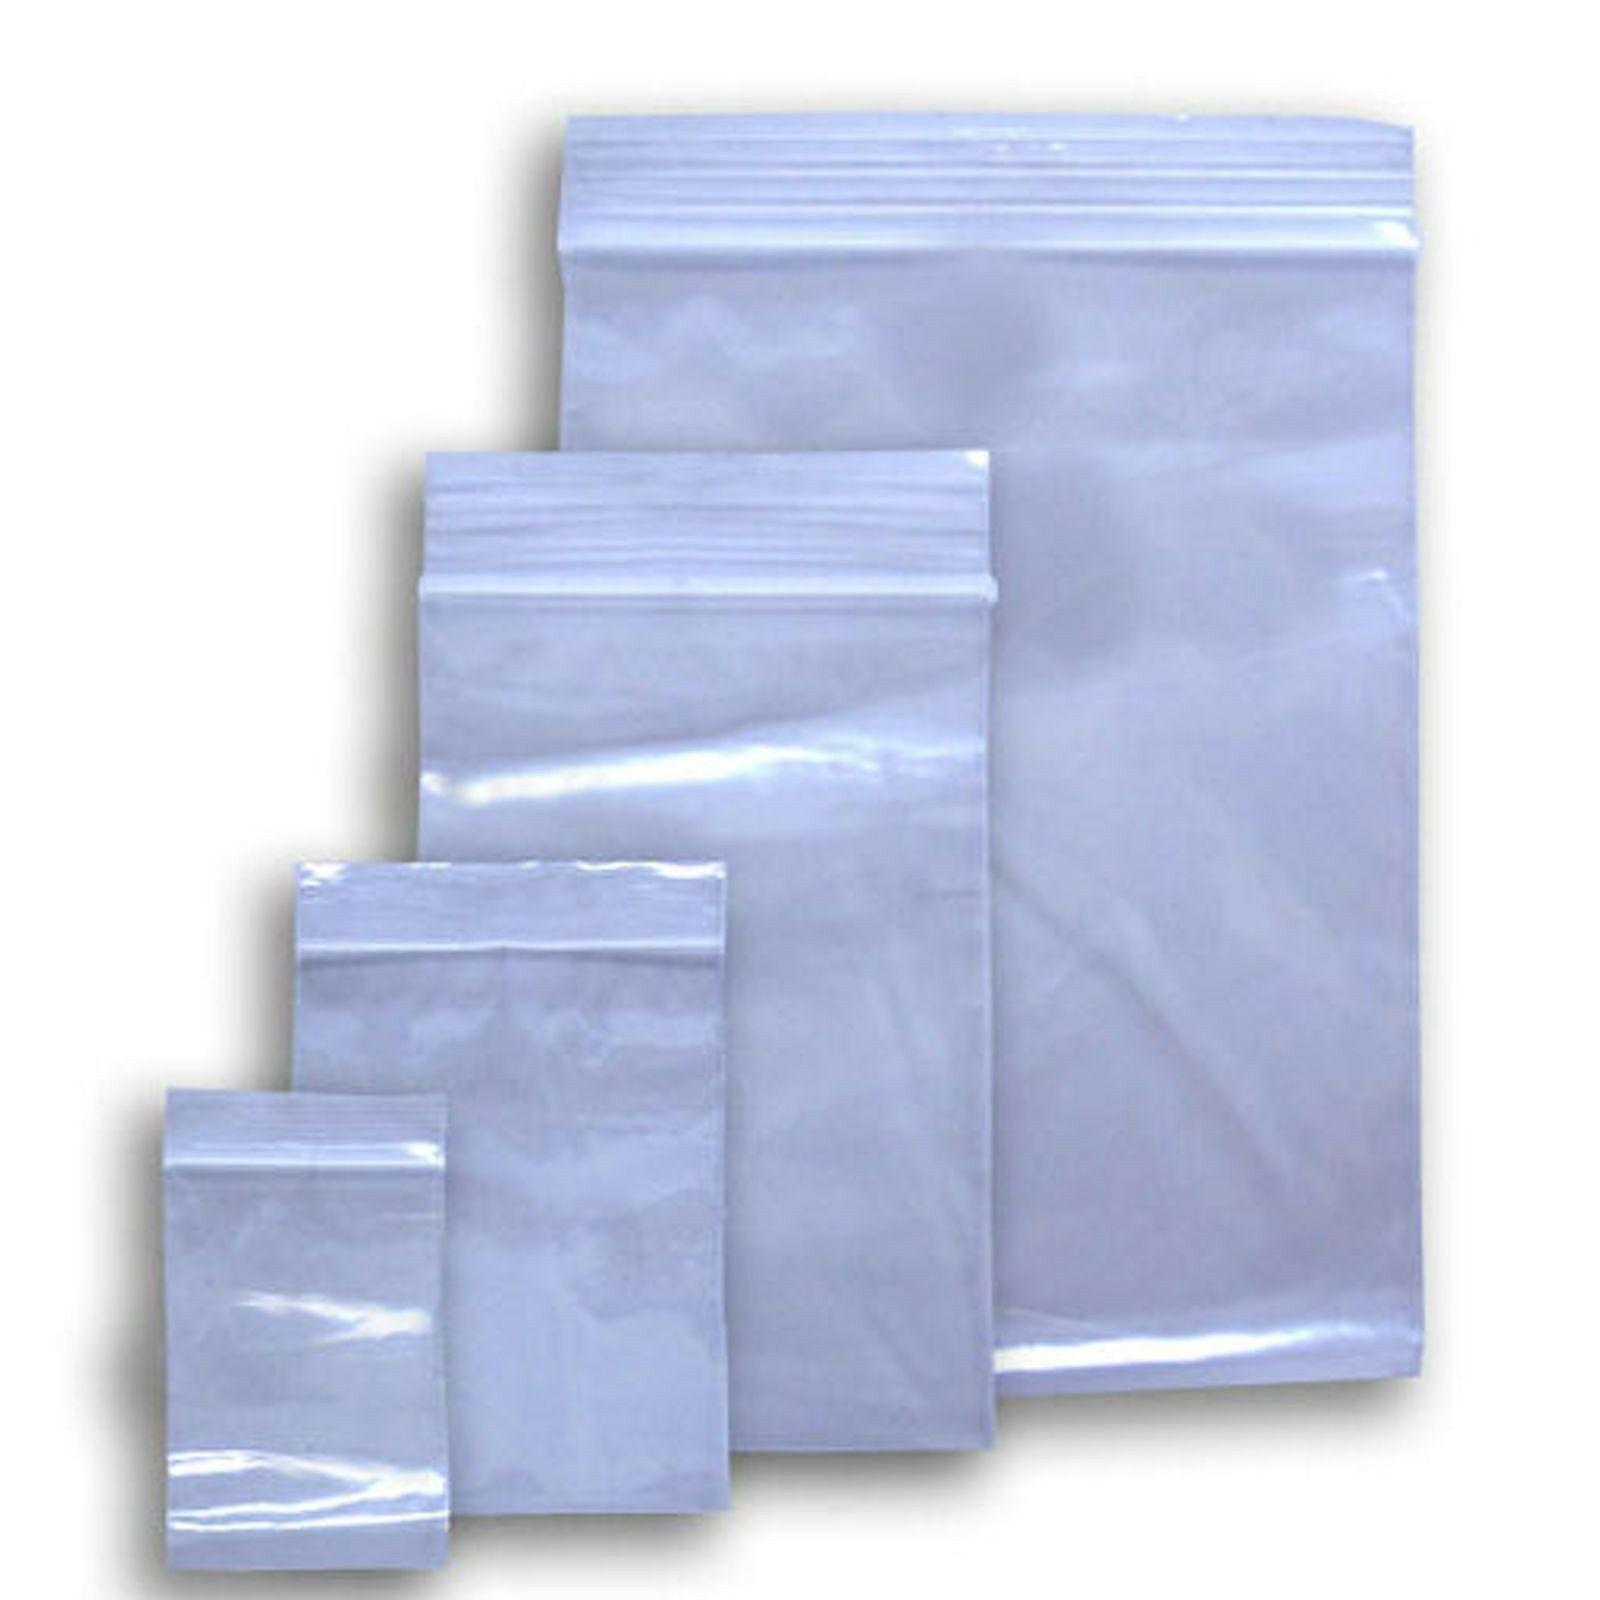 "Reclosable Poly Bag - 3"" x 4"" - 4 mil"